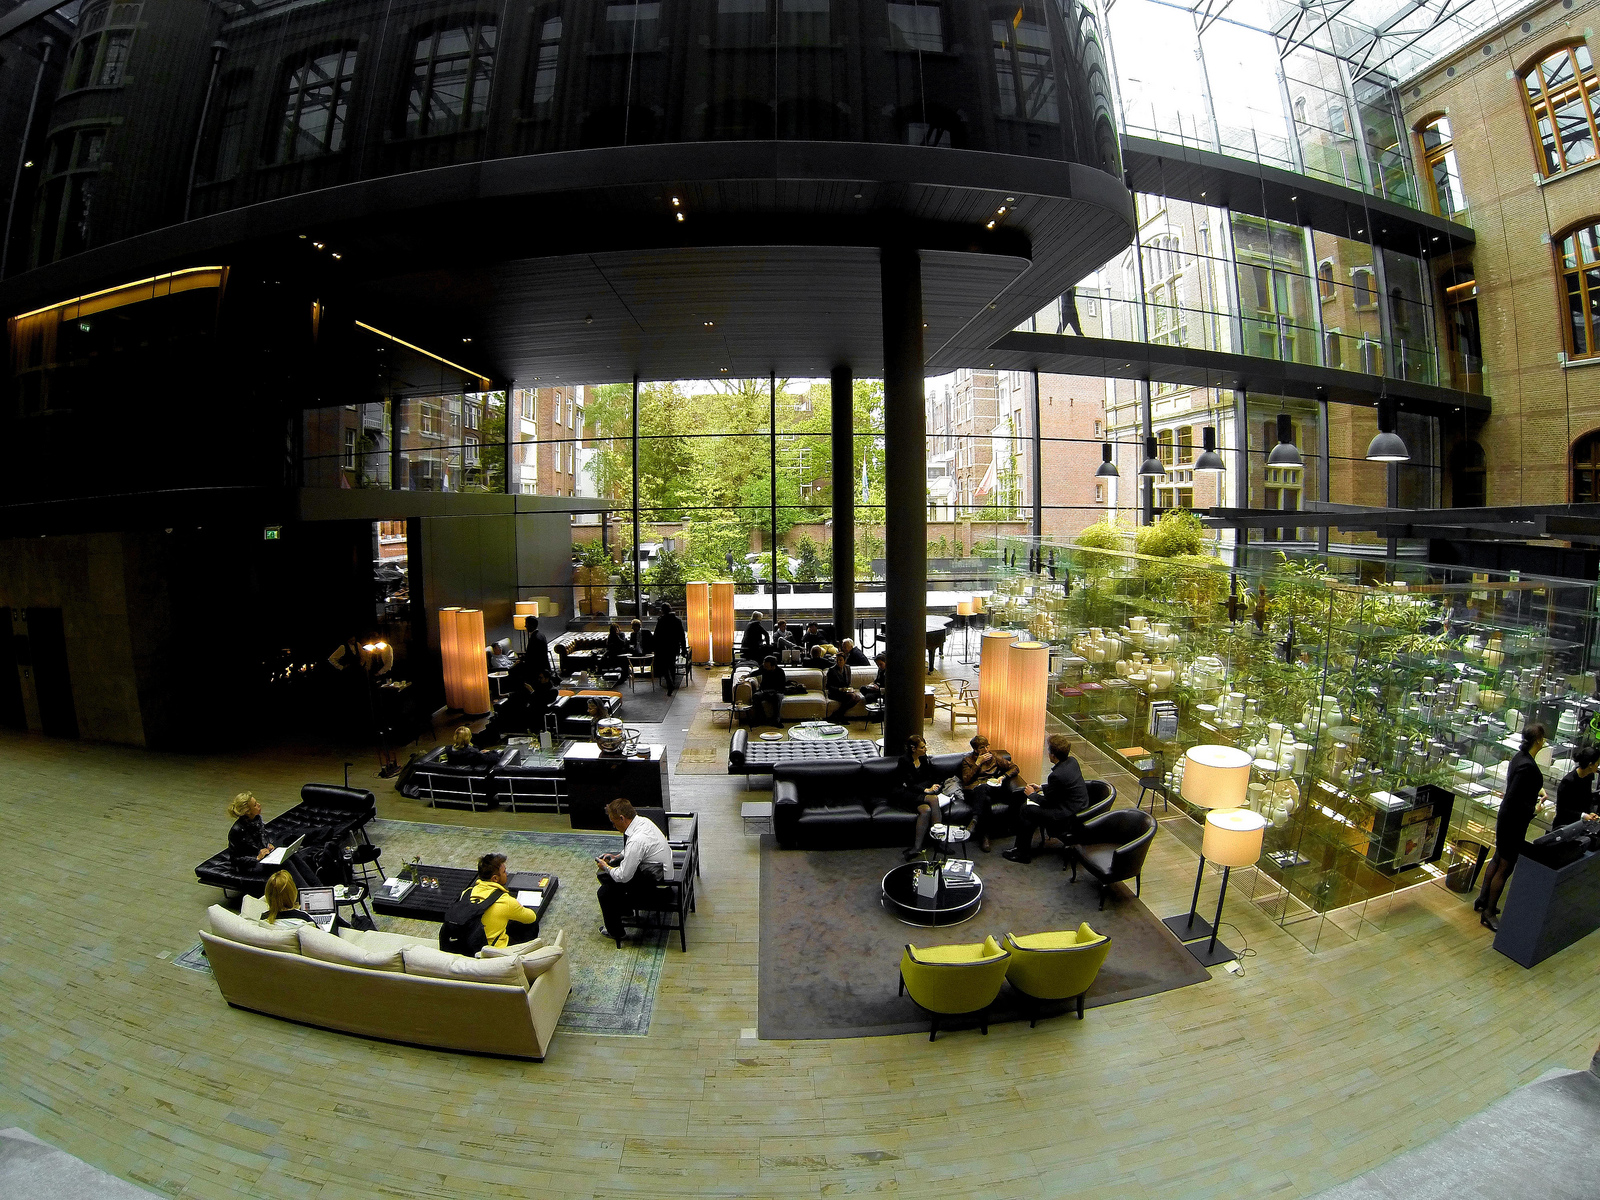 massive-lobby-entrance-area-front-courtyard-designed-by-piero-lissoni-conservatorium-hotel-amsterdam.jpg